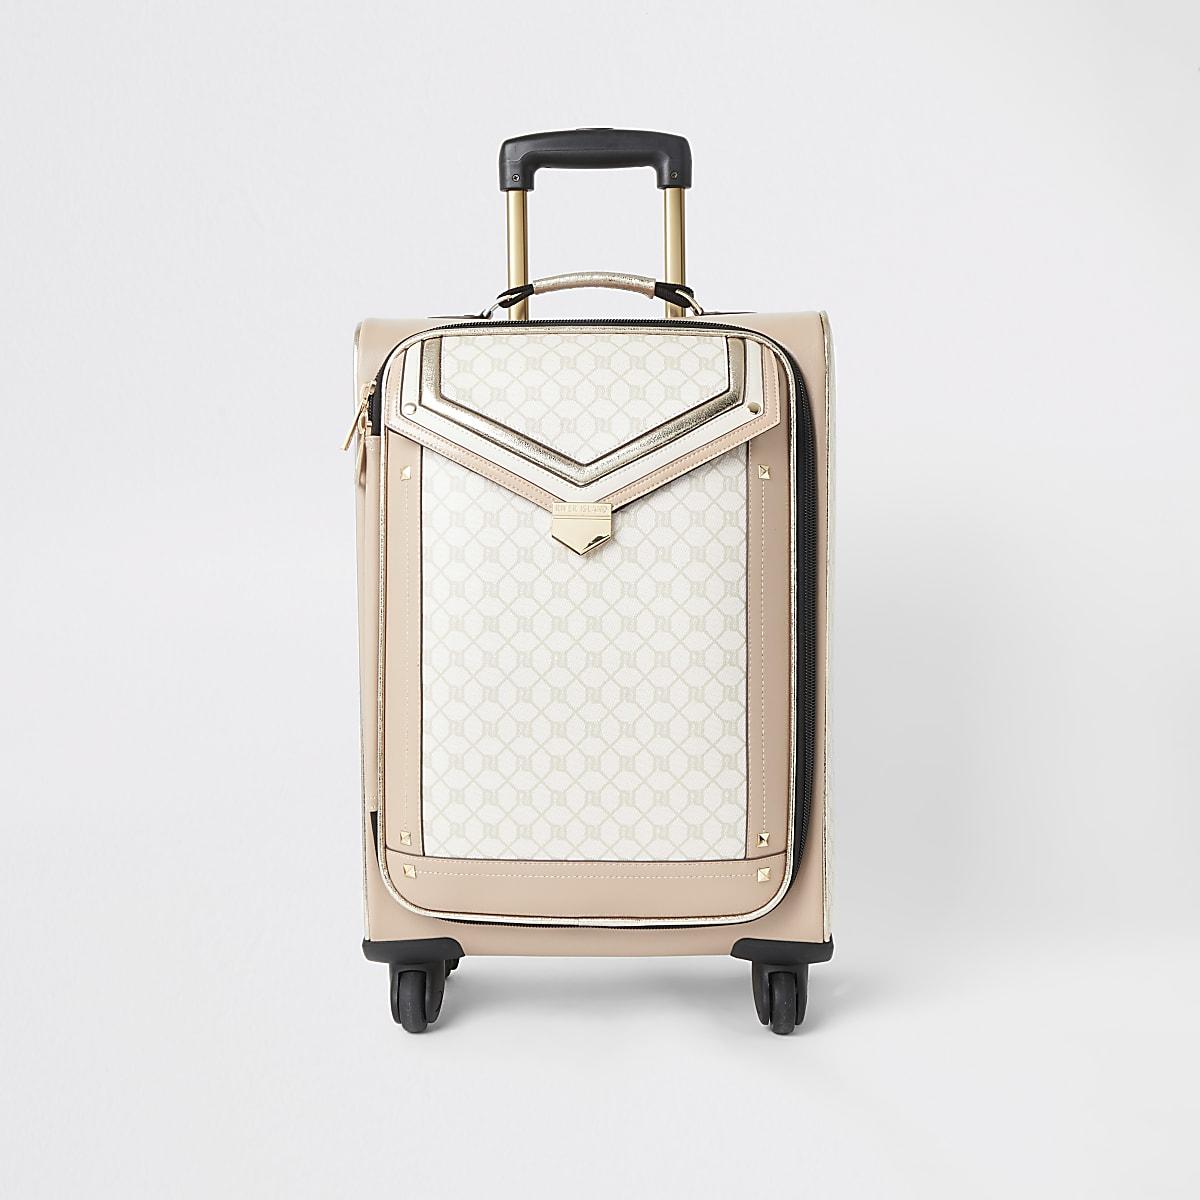 Valise beige à rabat avec monogramme RI